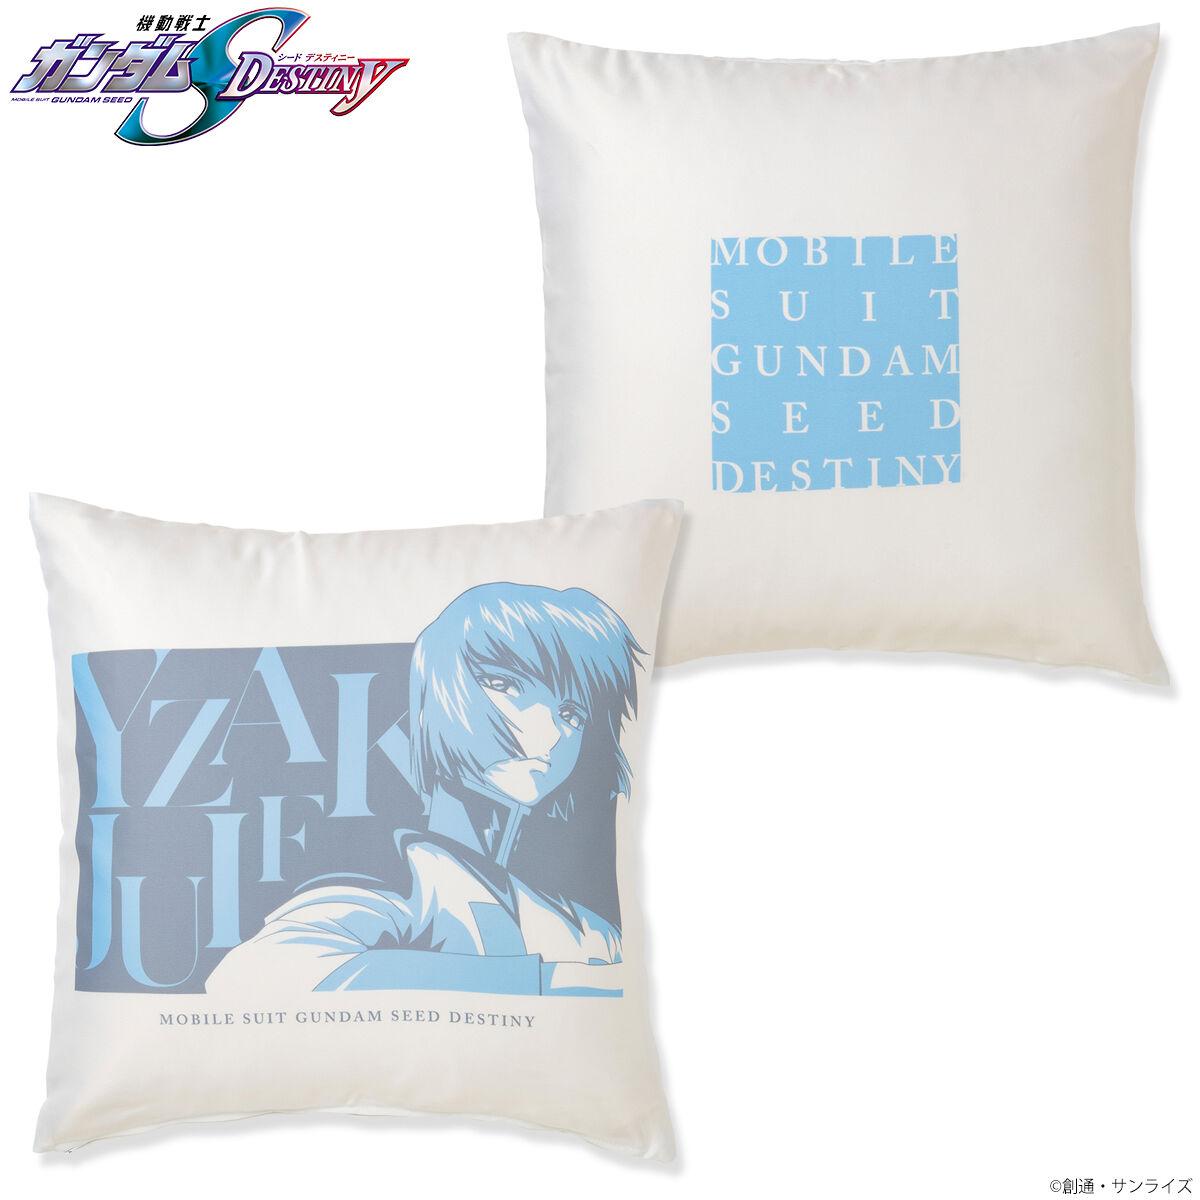 Mobile Suit Gundam SEED DESTINY Tricolor-themed Pillow Case